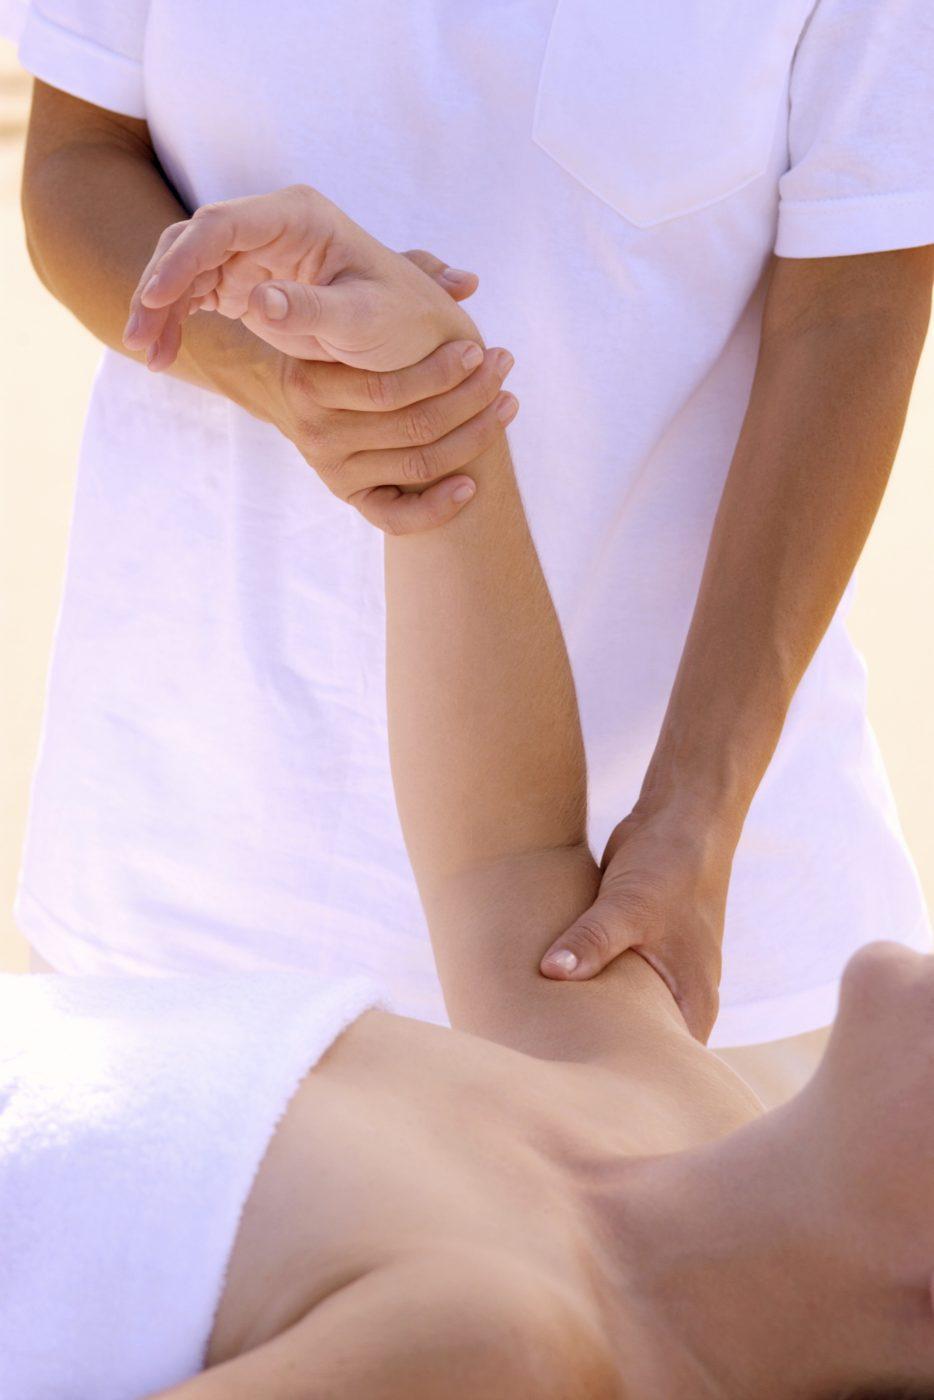 massage,body-massage-1428380, photographer-dcarson924